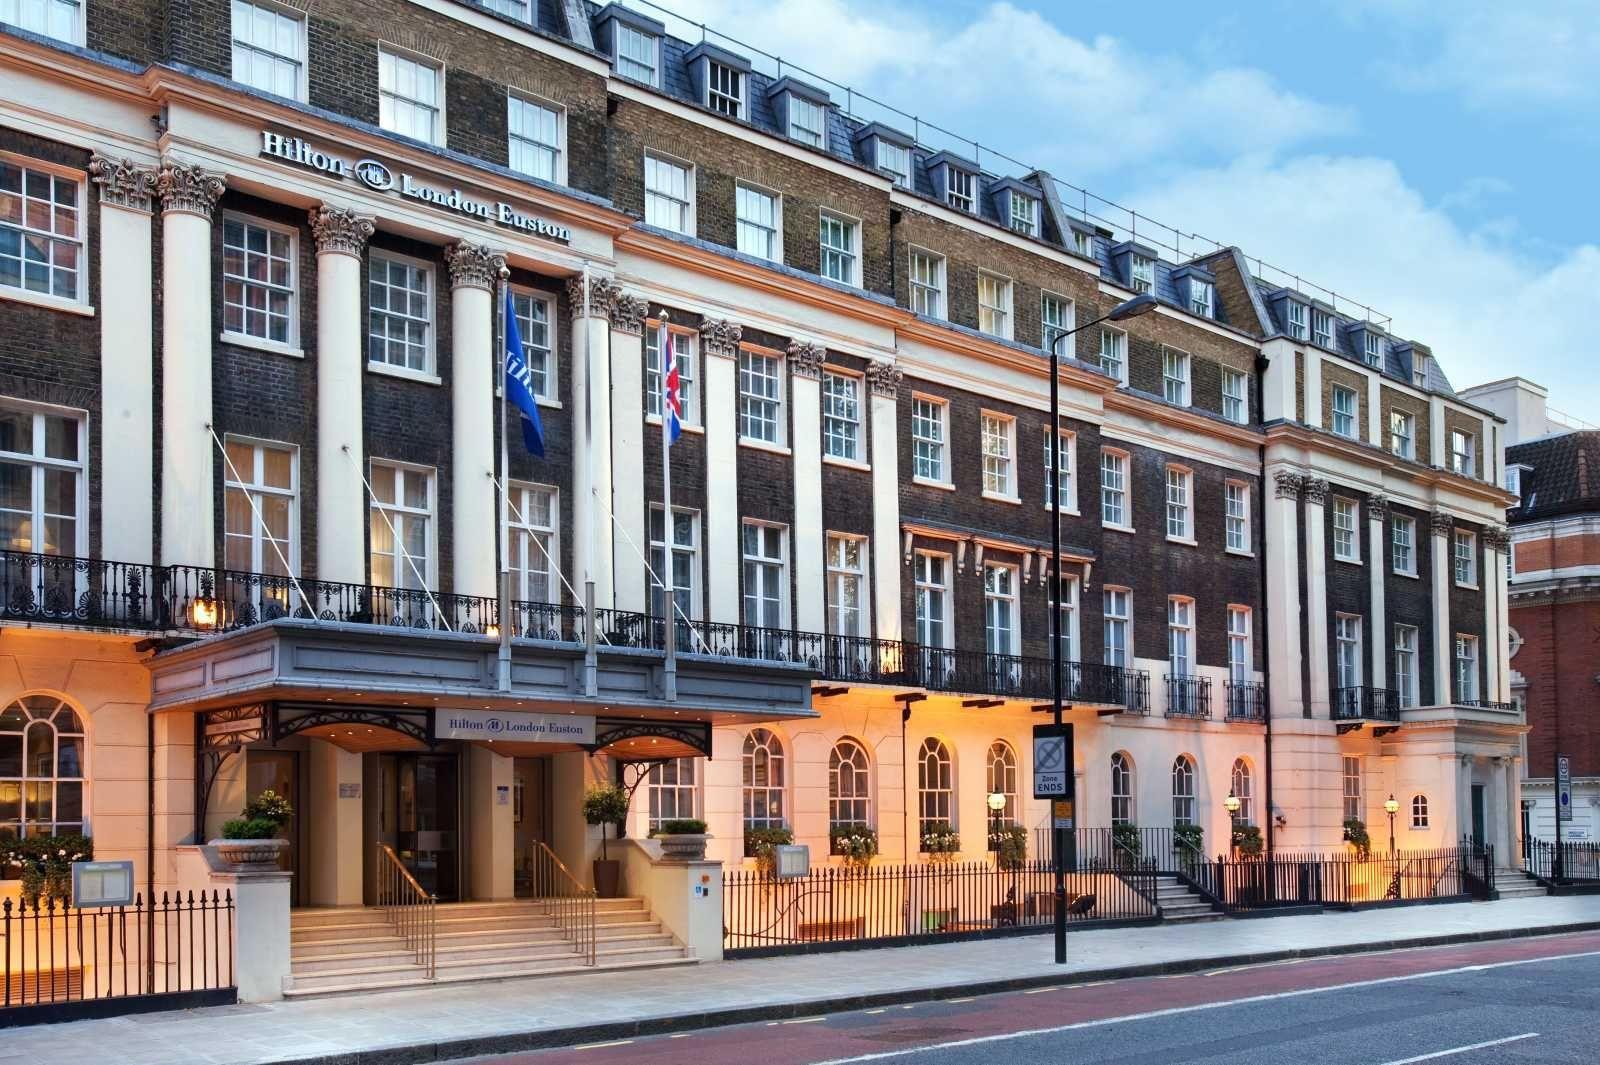 Hilton London Euston Hotel London Hotels London Stay Victorian Buildings